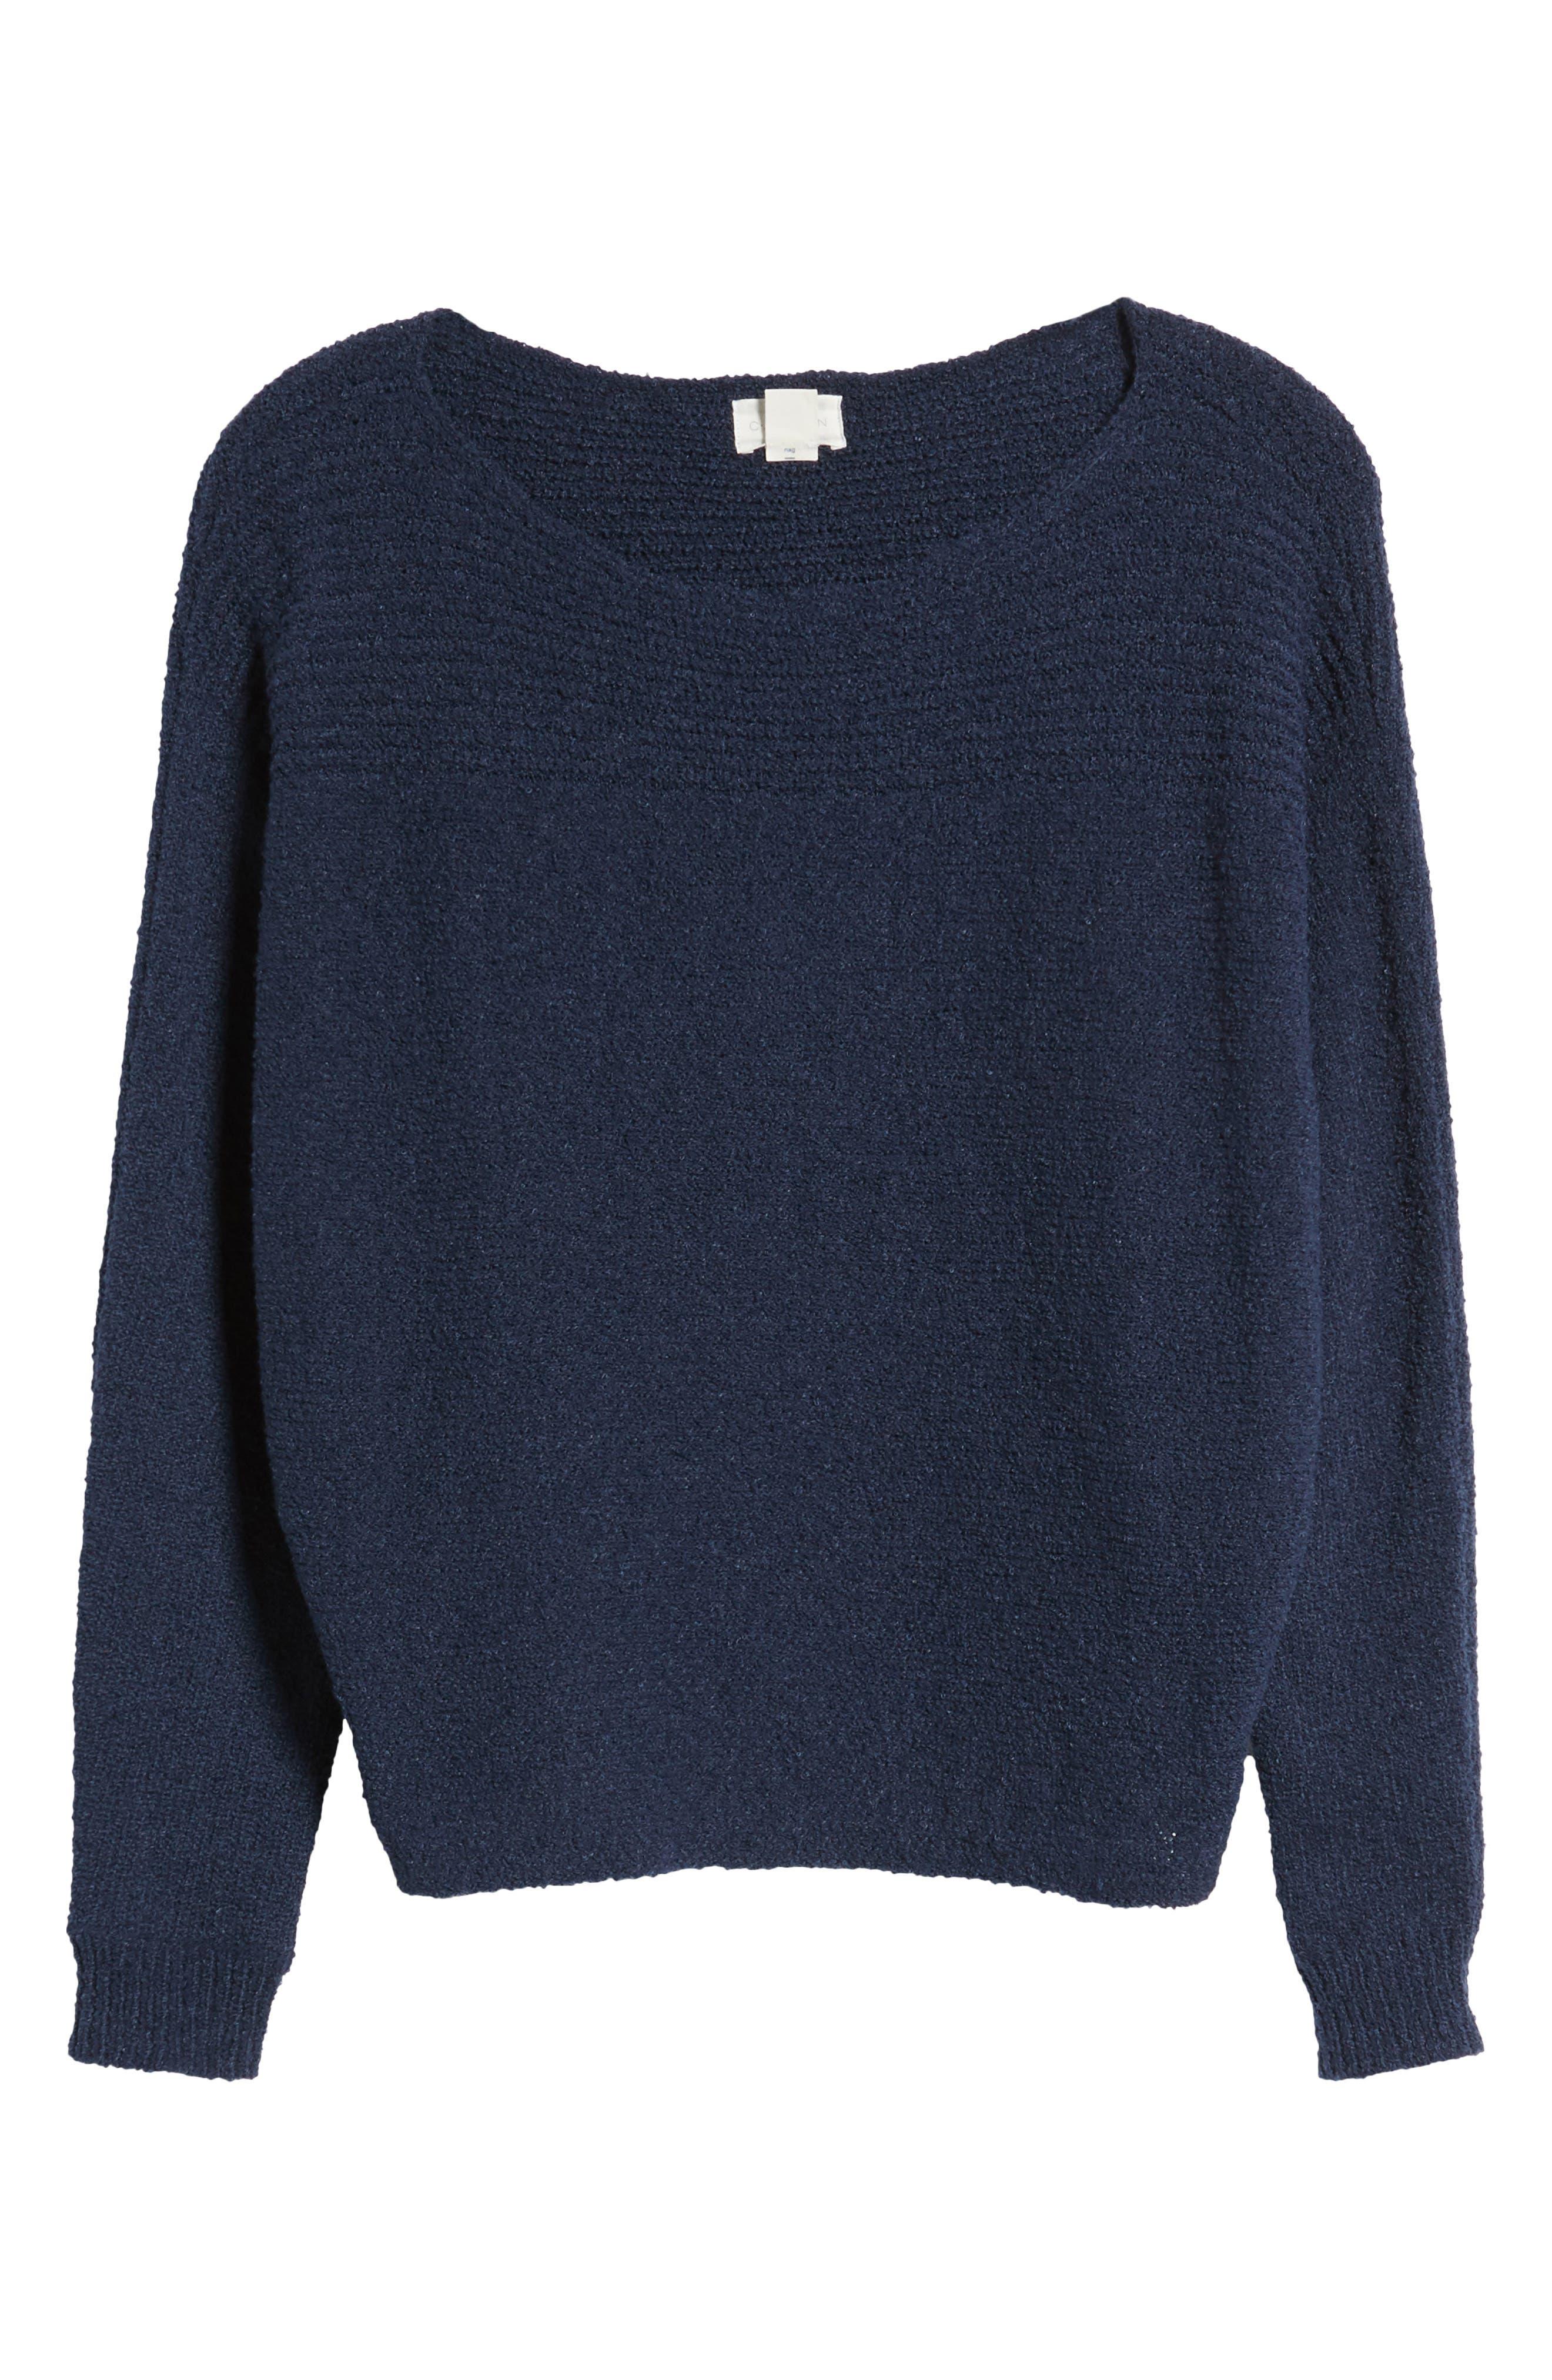 Calson<sup>®</sup> Dolman Sleeve Sweater,                             Alternate thumbnail 7, color,                             Navy Indigo